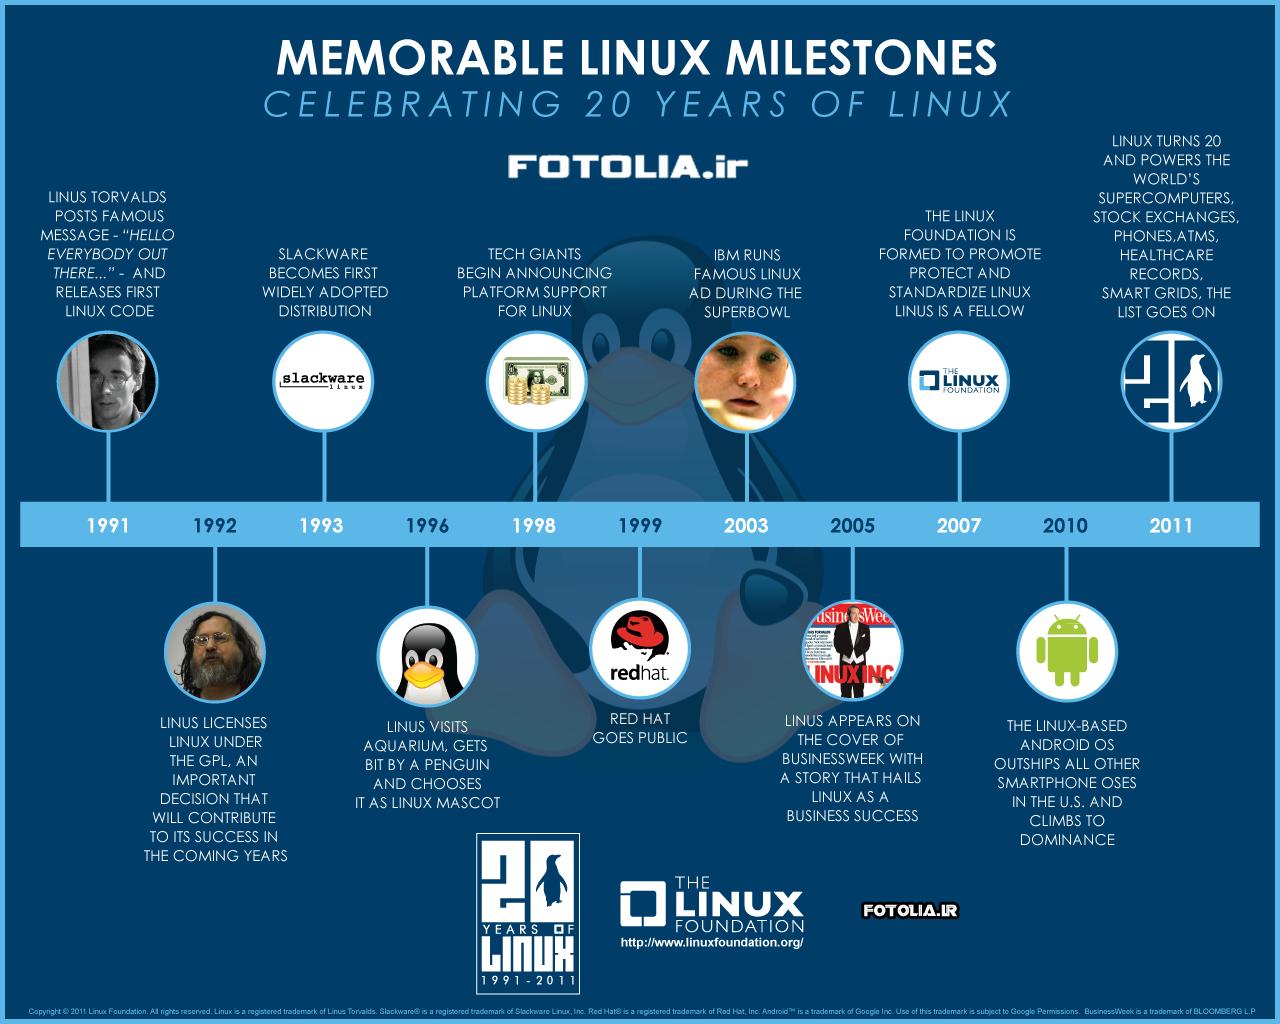 به مناسبت جشن تولد ۲۰ سالگی لینوکس